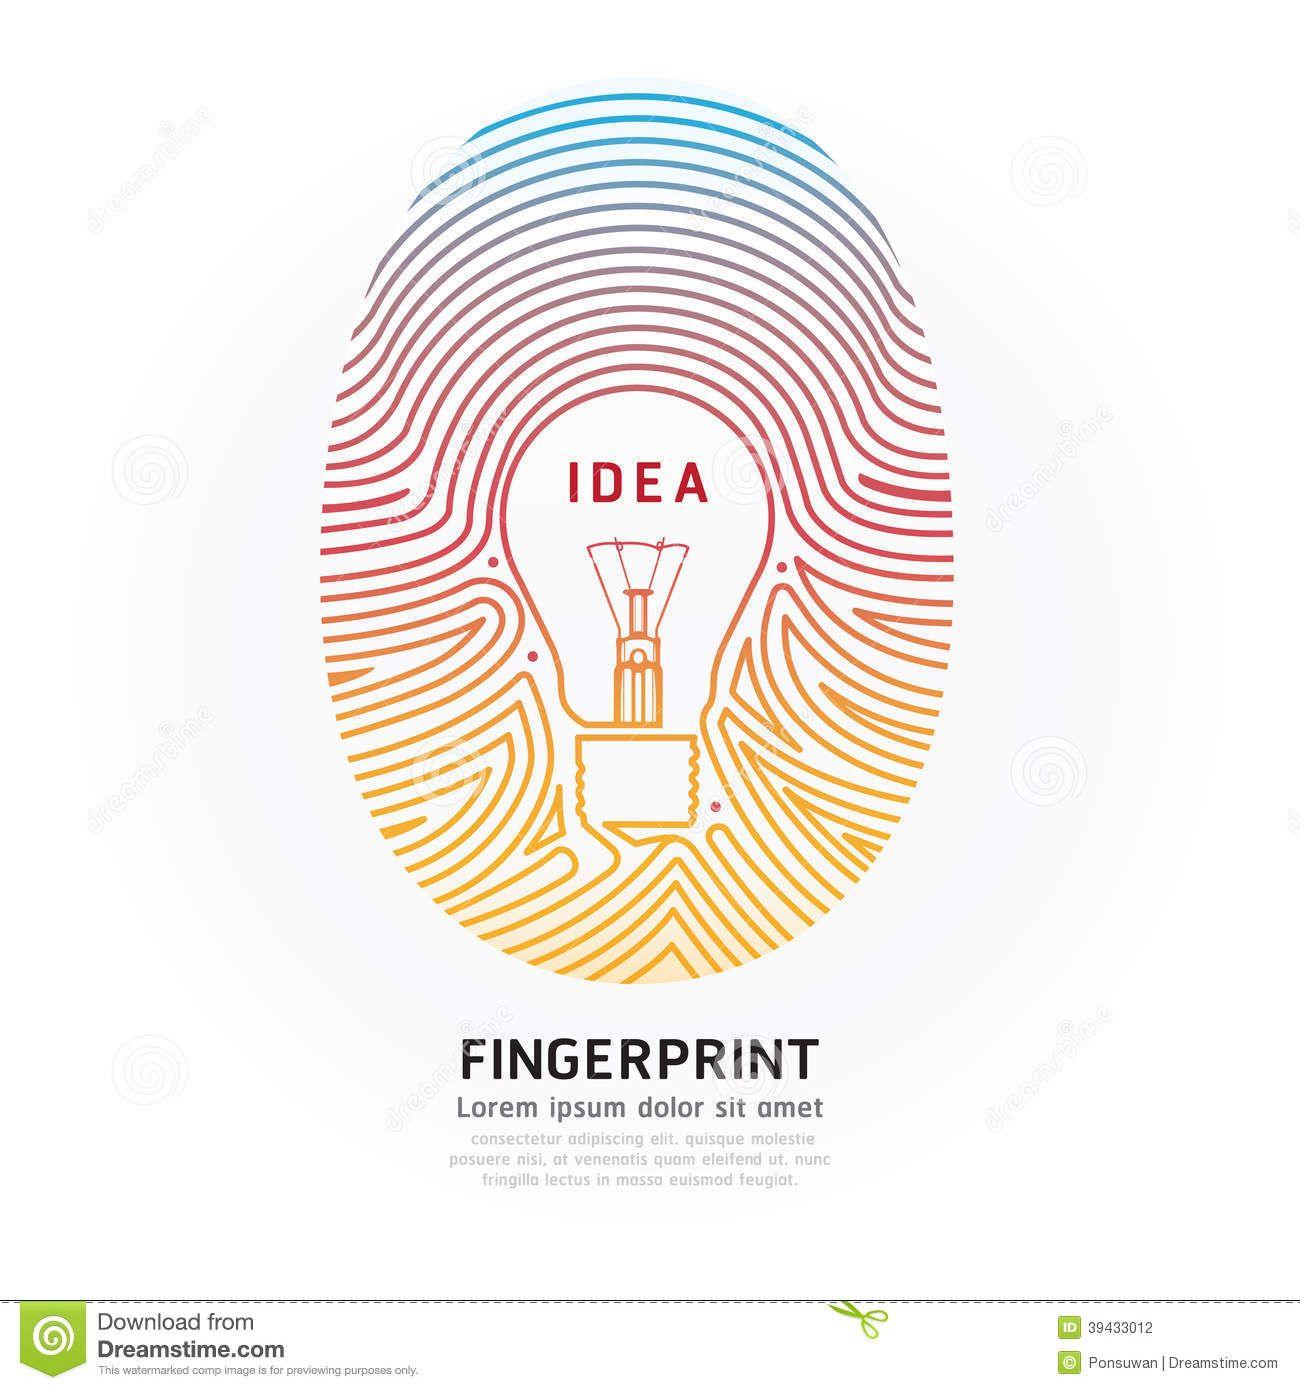 Fingerprint Lightbulb Color Vector Design Illustration 39433012 Jpg 1 300 1 390 Pixels Log In For S Illustration Vectorielle Empreinte Digitale Illustration